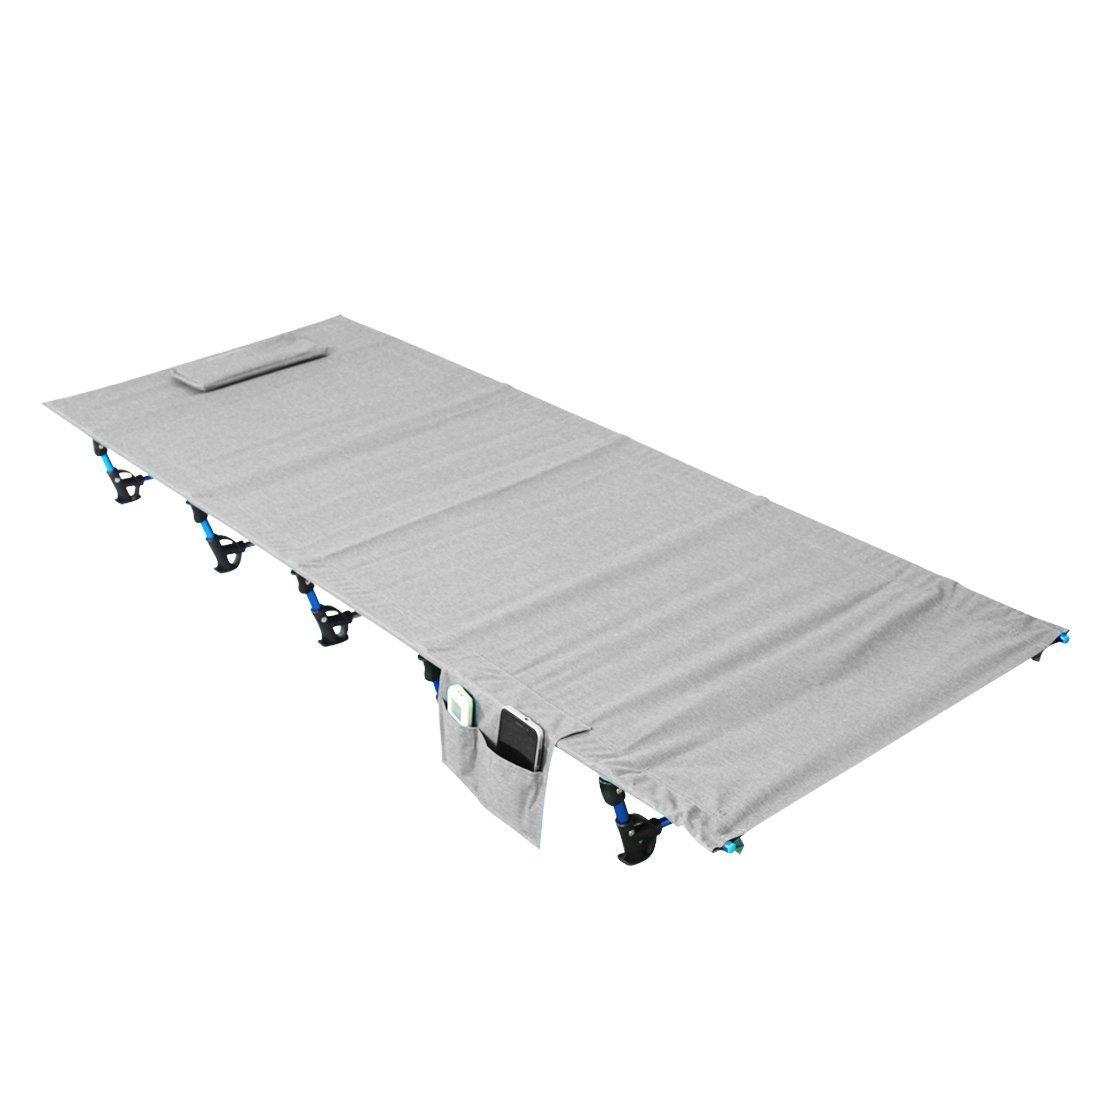 Luufan Ultraleicht Klapp Camping Bett Tragbare Campingbett mit Tragetasche, Camping Liege Kinderbett Ersatz Aluminiumlegierung für Indoor Outdoor Reise Wandern Jagd (190  70 cm)